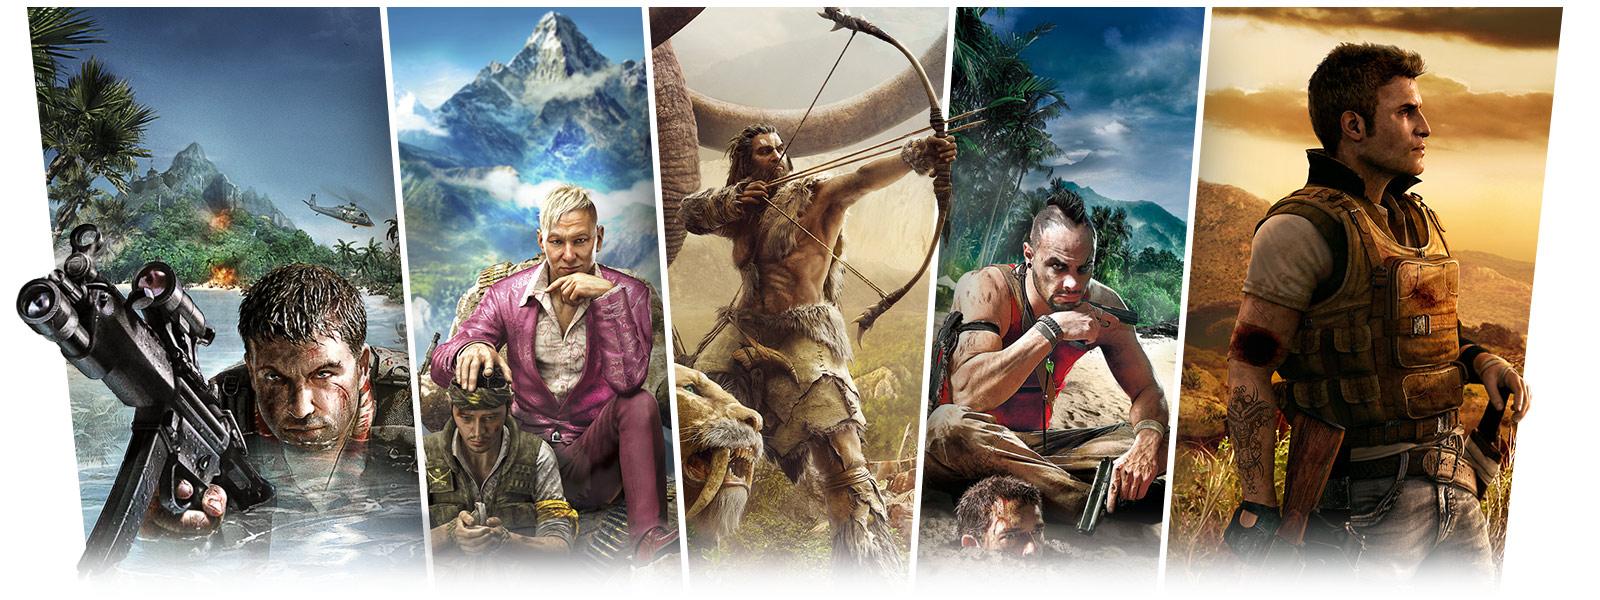 Far Cry screenshots of Far Cry 2, Far Cry 4, Far Cry Primal, FarCry 3, Far Cry Adventures